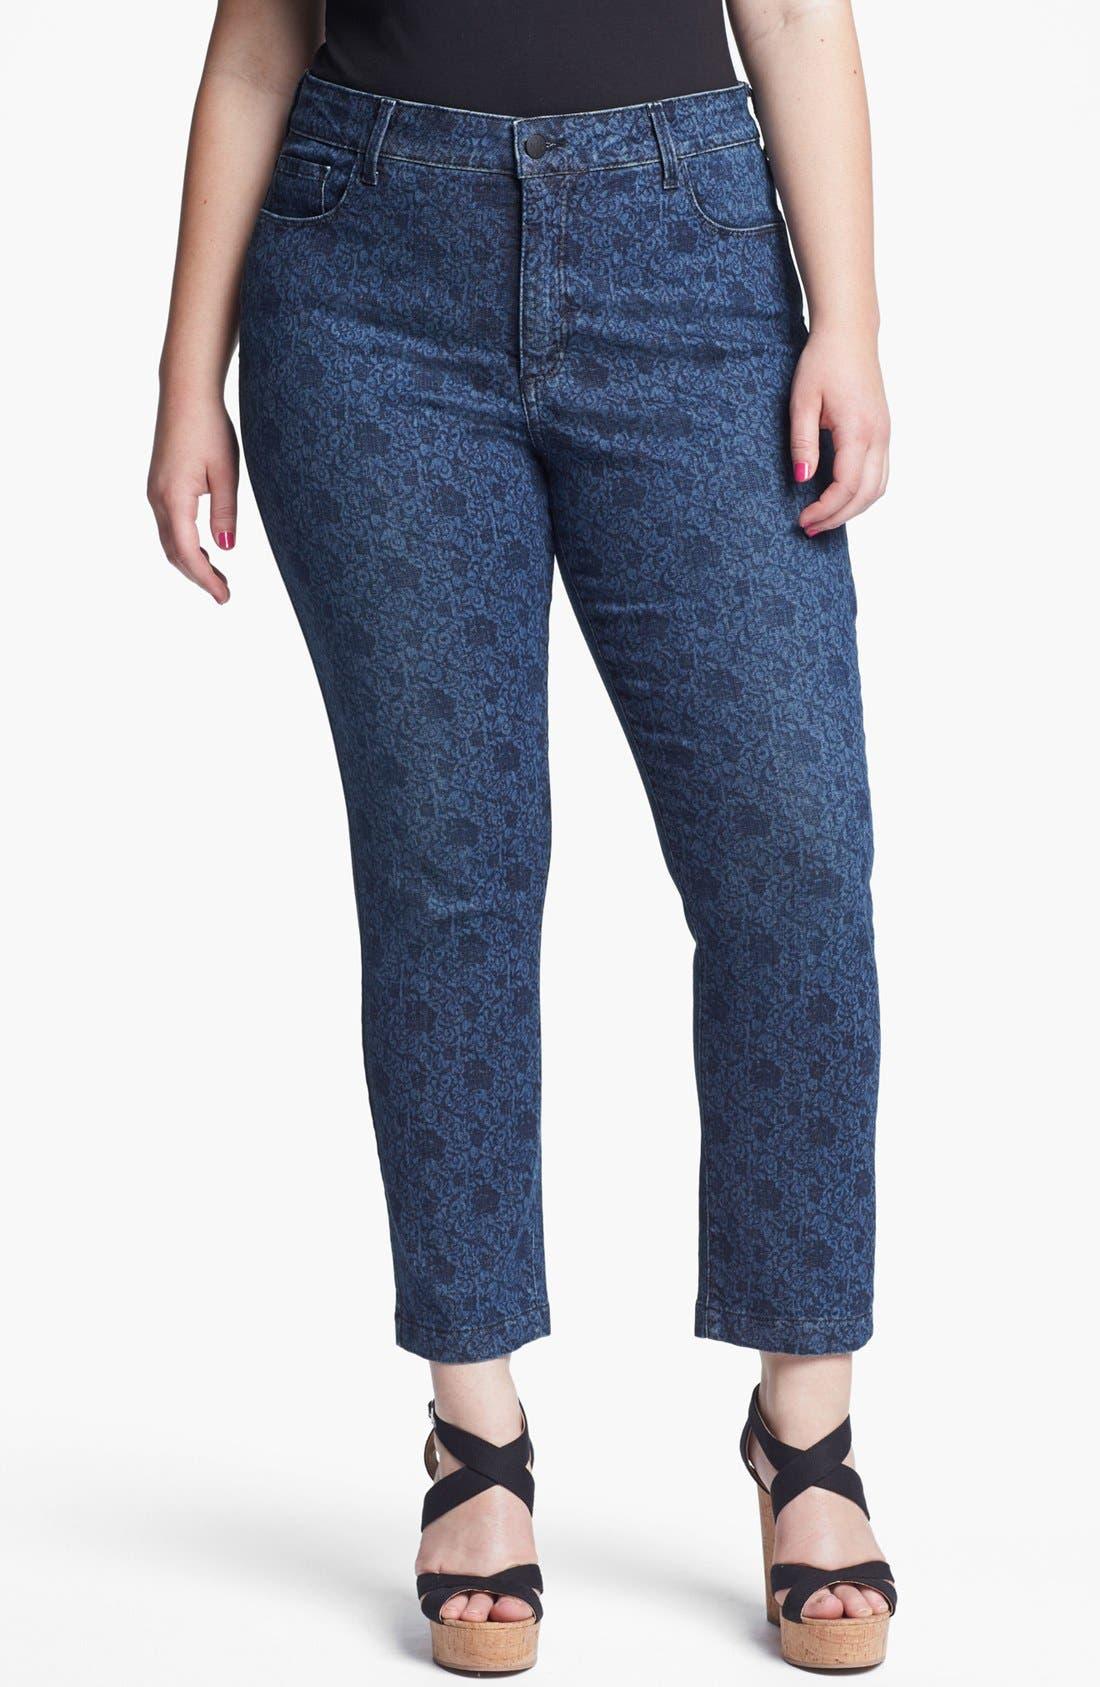 Main Image - NYDJ 'Audrey' Rose Print Ankle Jeans (Plus Size)